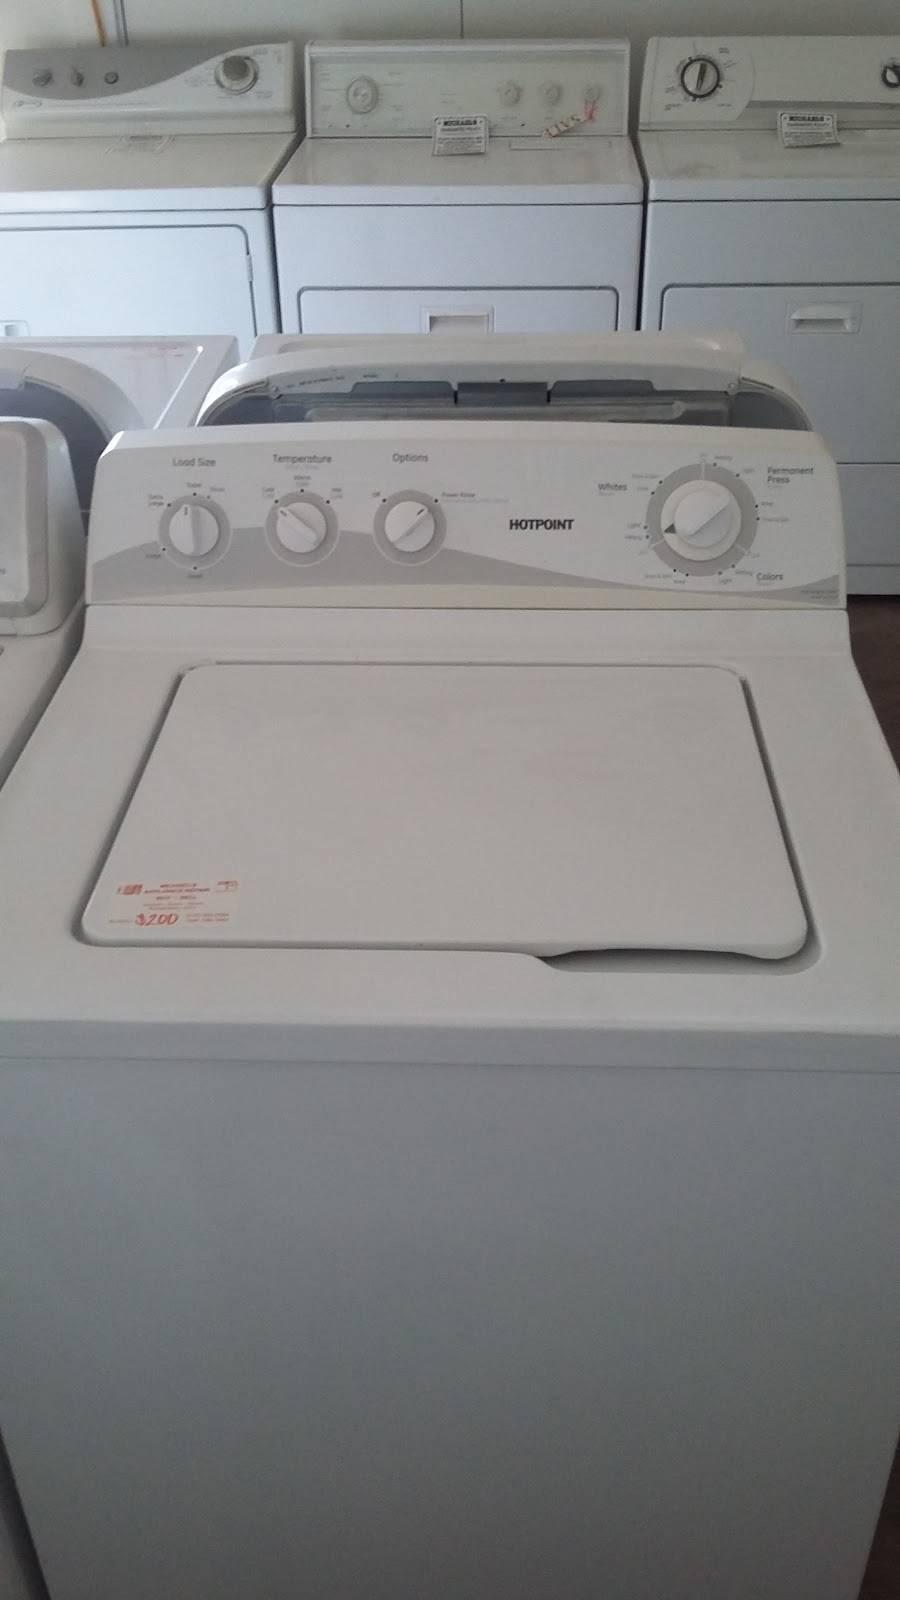 michael's appliances - home goods store  | Photo 1 of 5 | Address: 2214 Nogalitos St, San Antonio, TX 78225, USA | Phone: (210) 789-1483